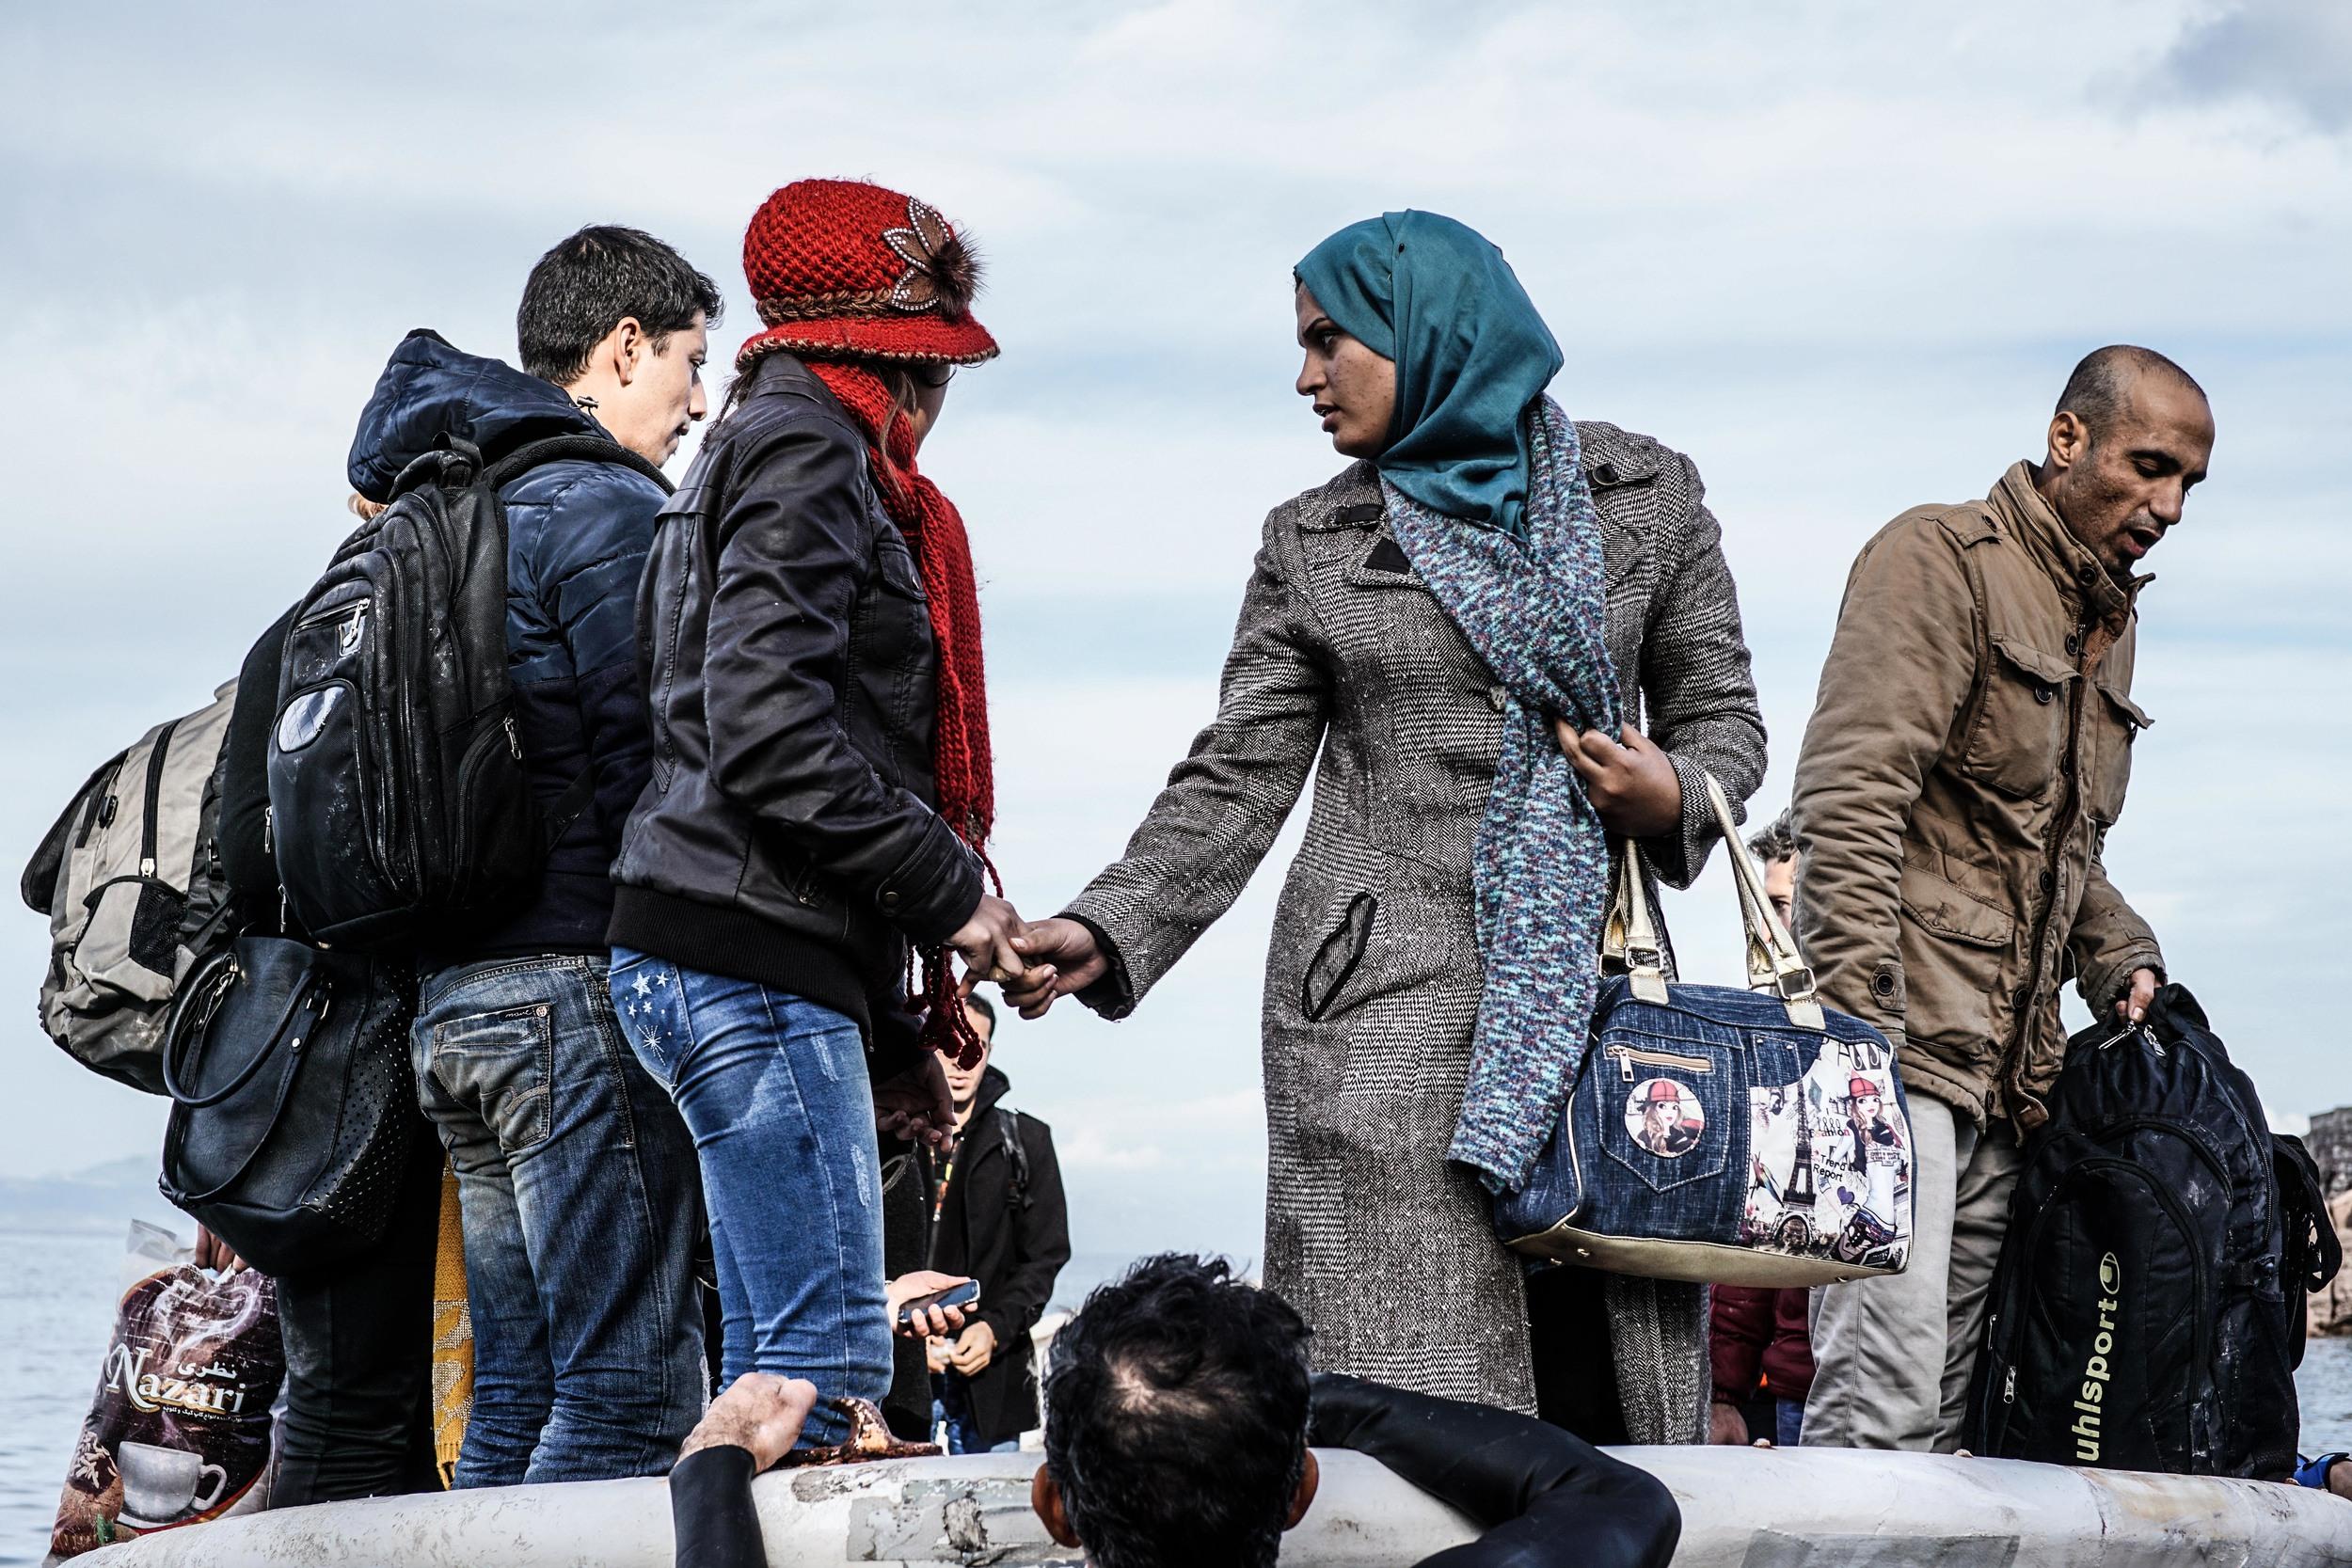 Syrian Refugee Crisis Lesbos Greece November 2015 28.jpg